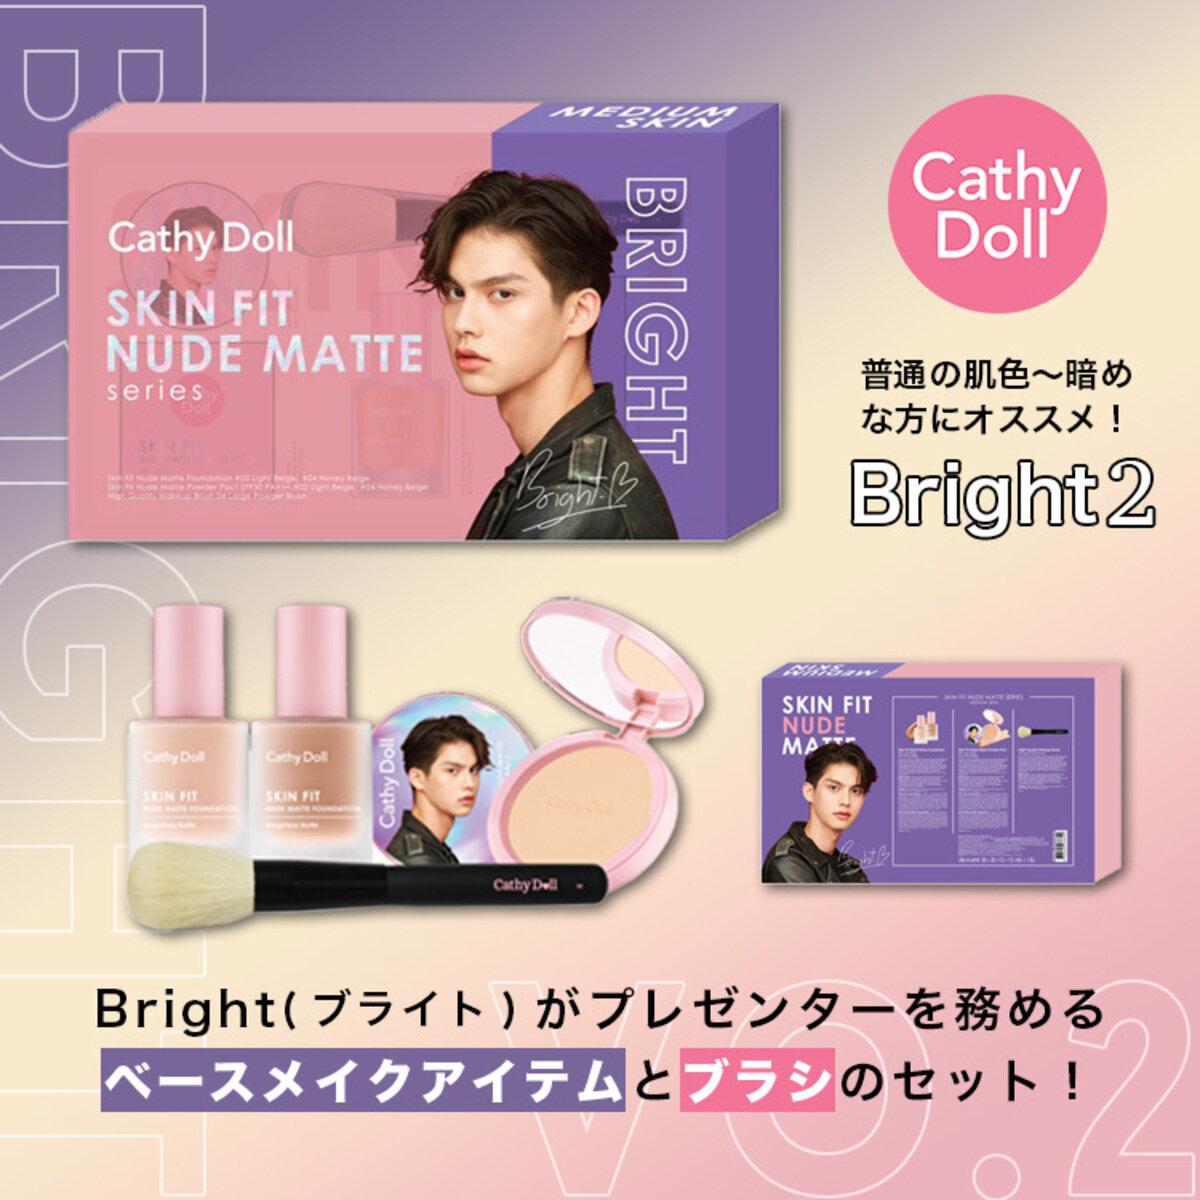 CathyDoll プレミアムセット Bright2